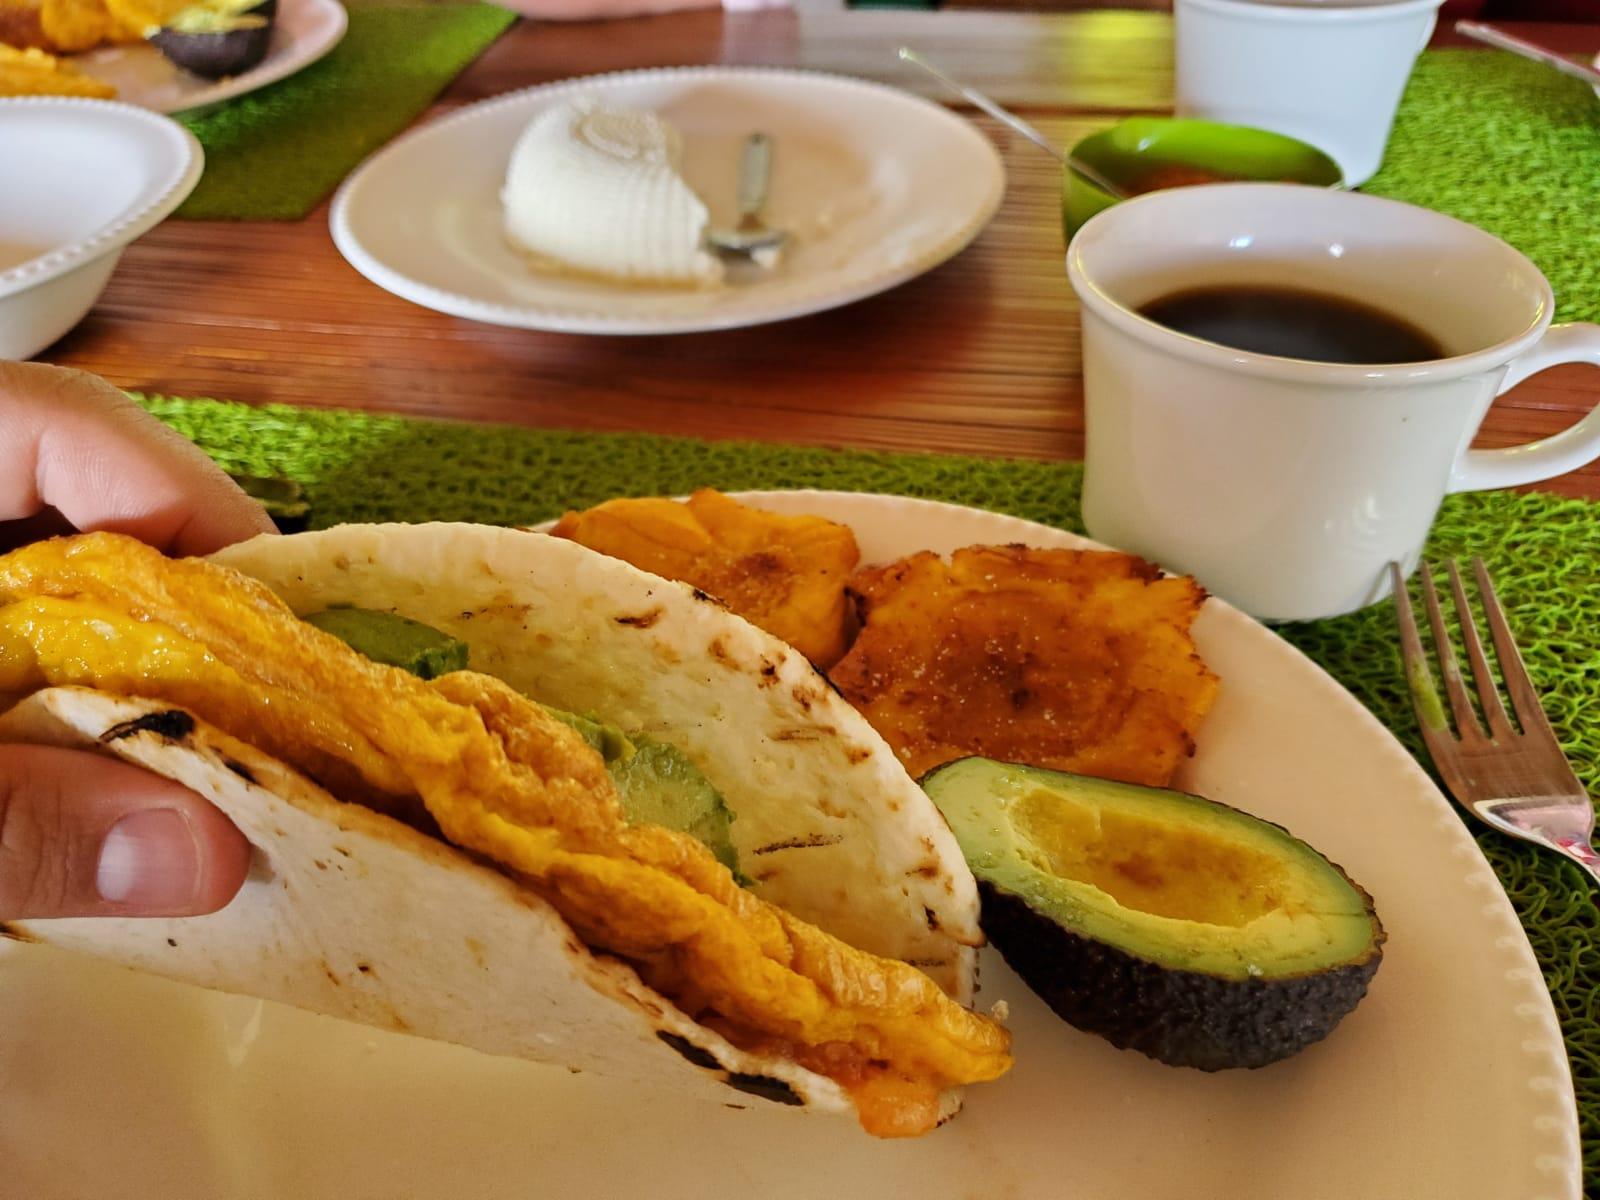 Breakfast at Finca Mariposa